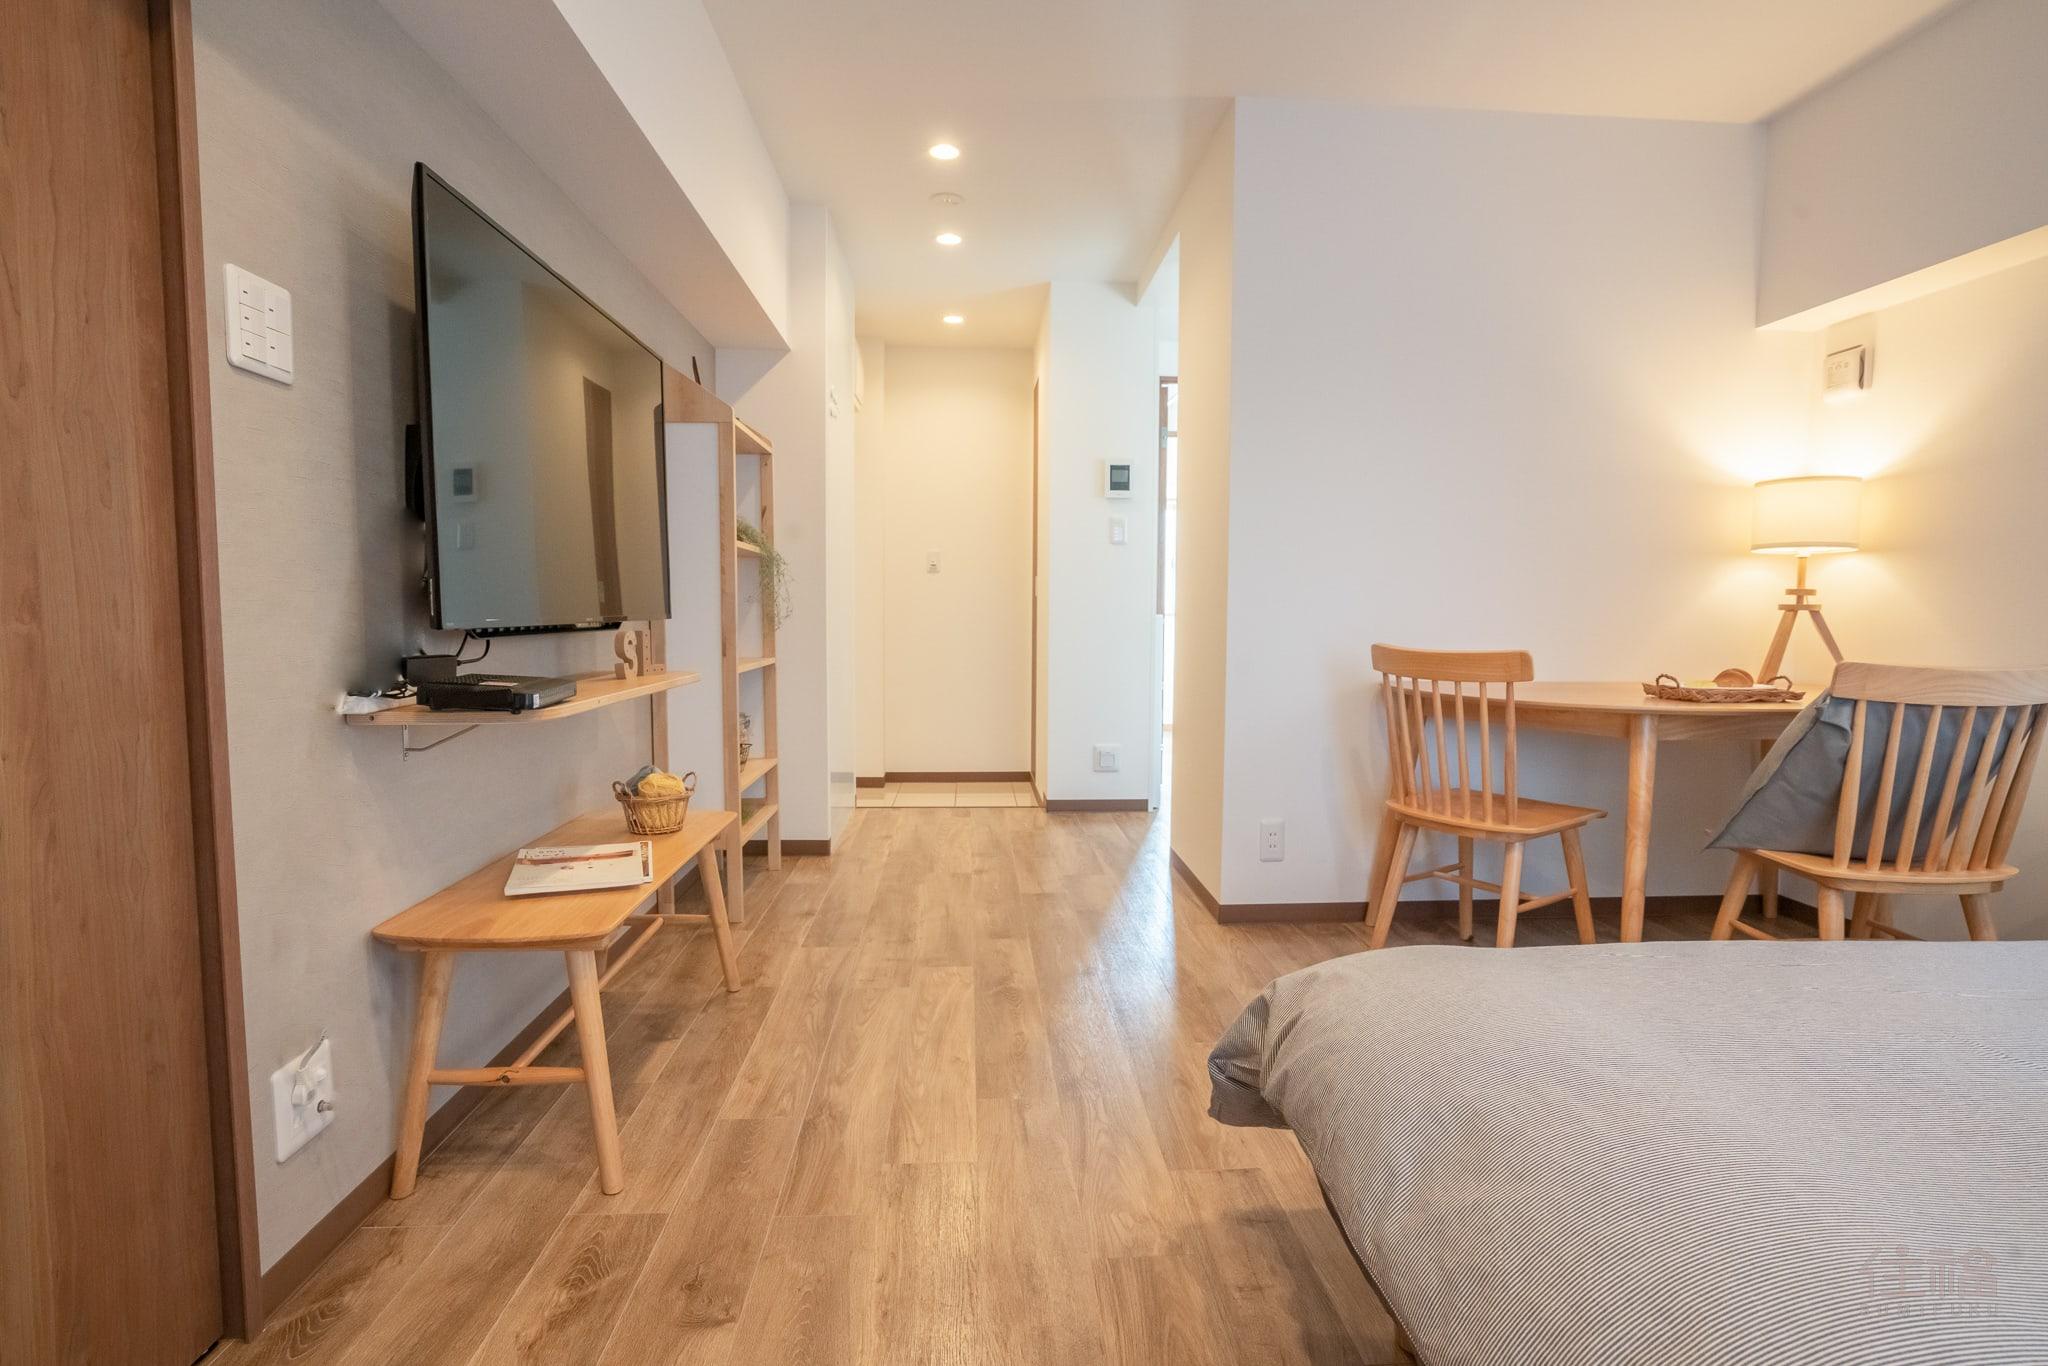 SL302 東京住福民宿 SUMIFUKU Tokyo Rental Apartment & Hotel